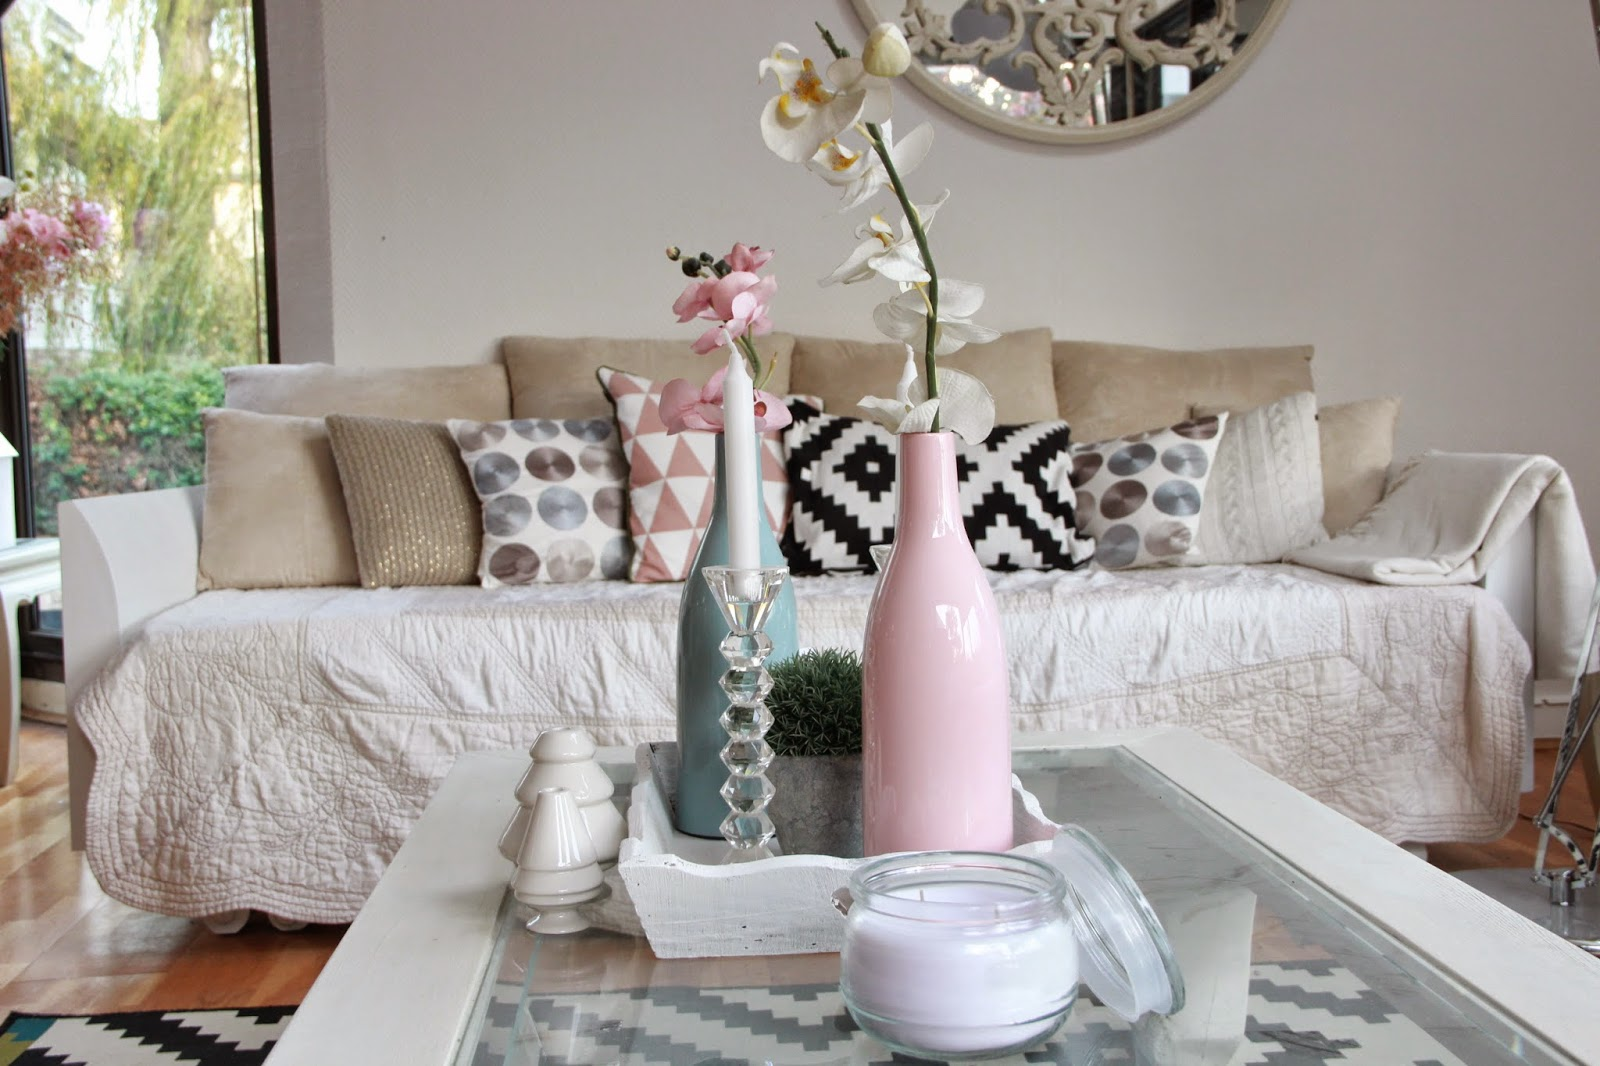 ma nouvelle deco whenshabbyloveschic. Black Bedroom Furniture Sets. Home Design Ideas